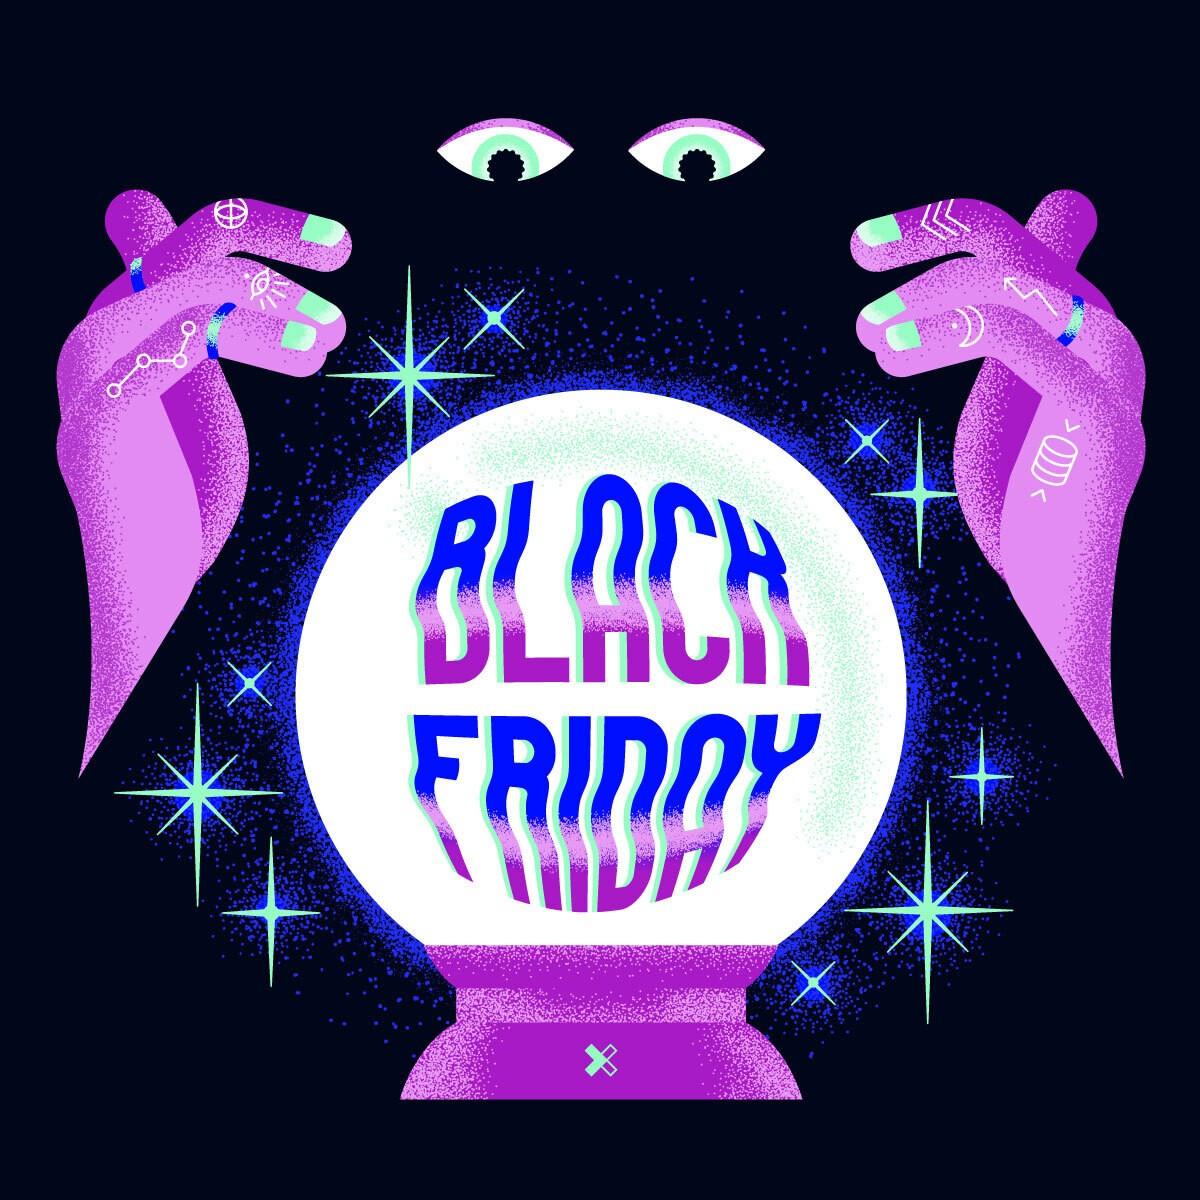 Feed_Black-Friday_Predictions